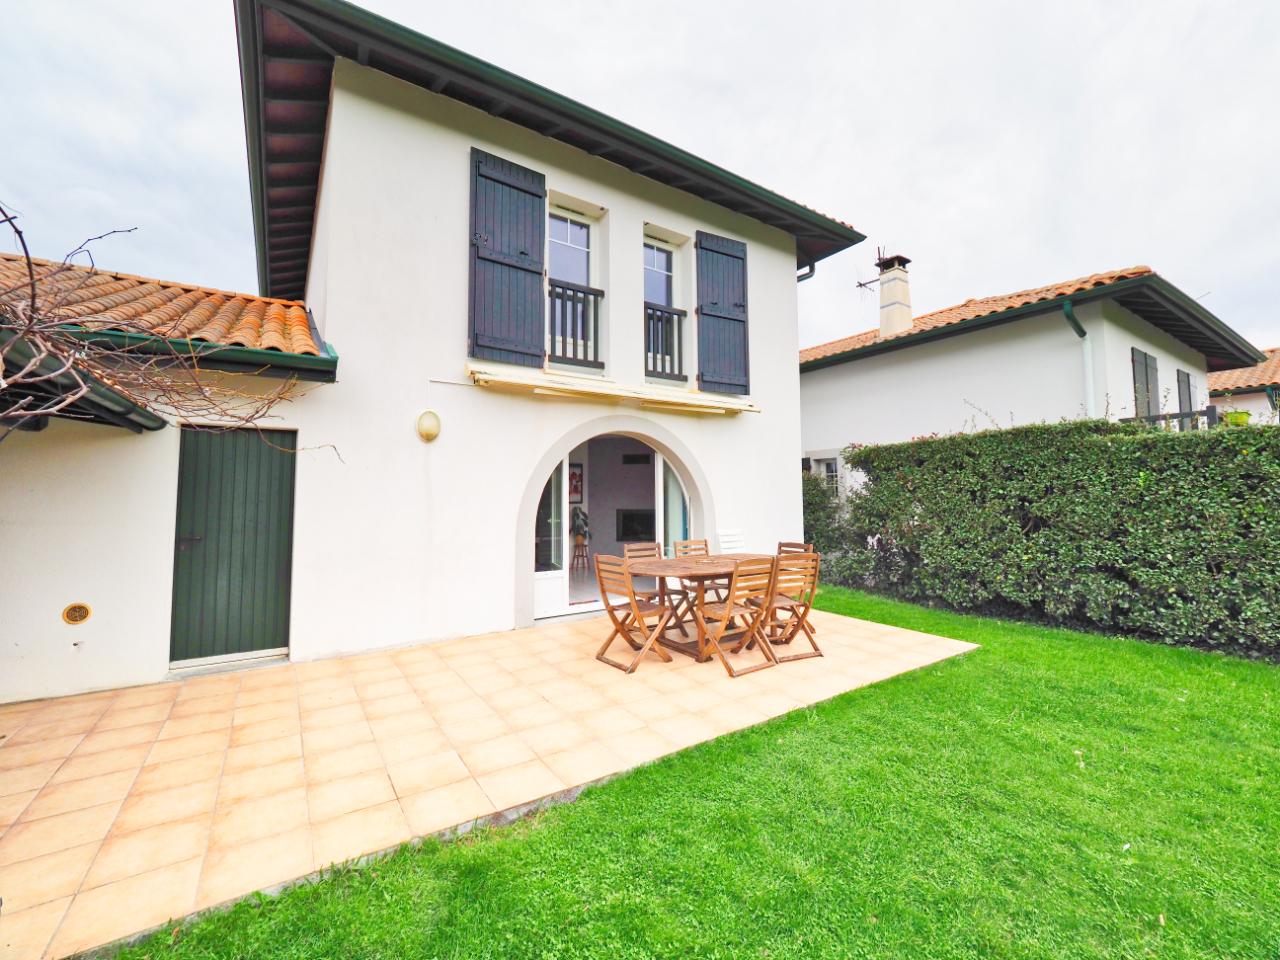 vente maison à URRUGNE - 390 000